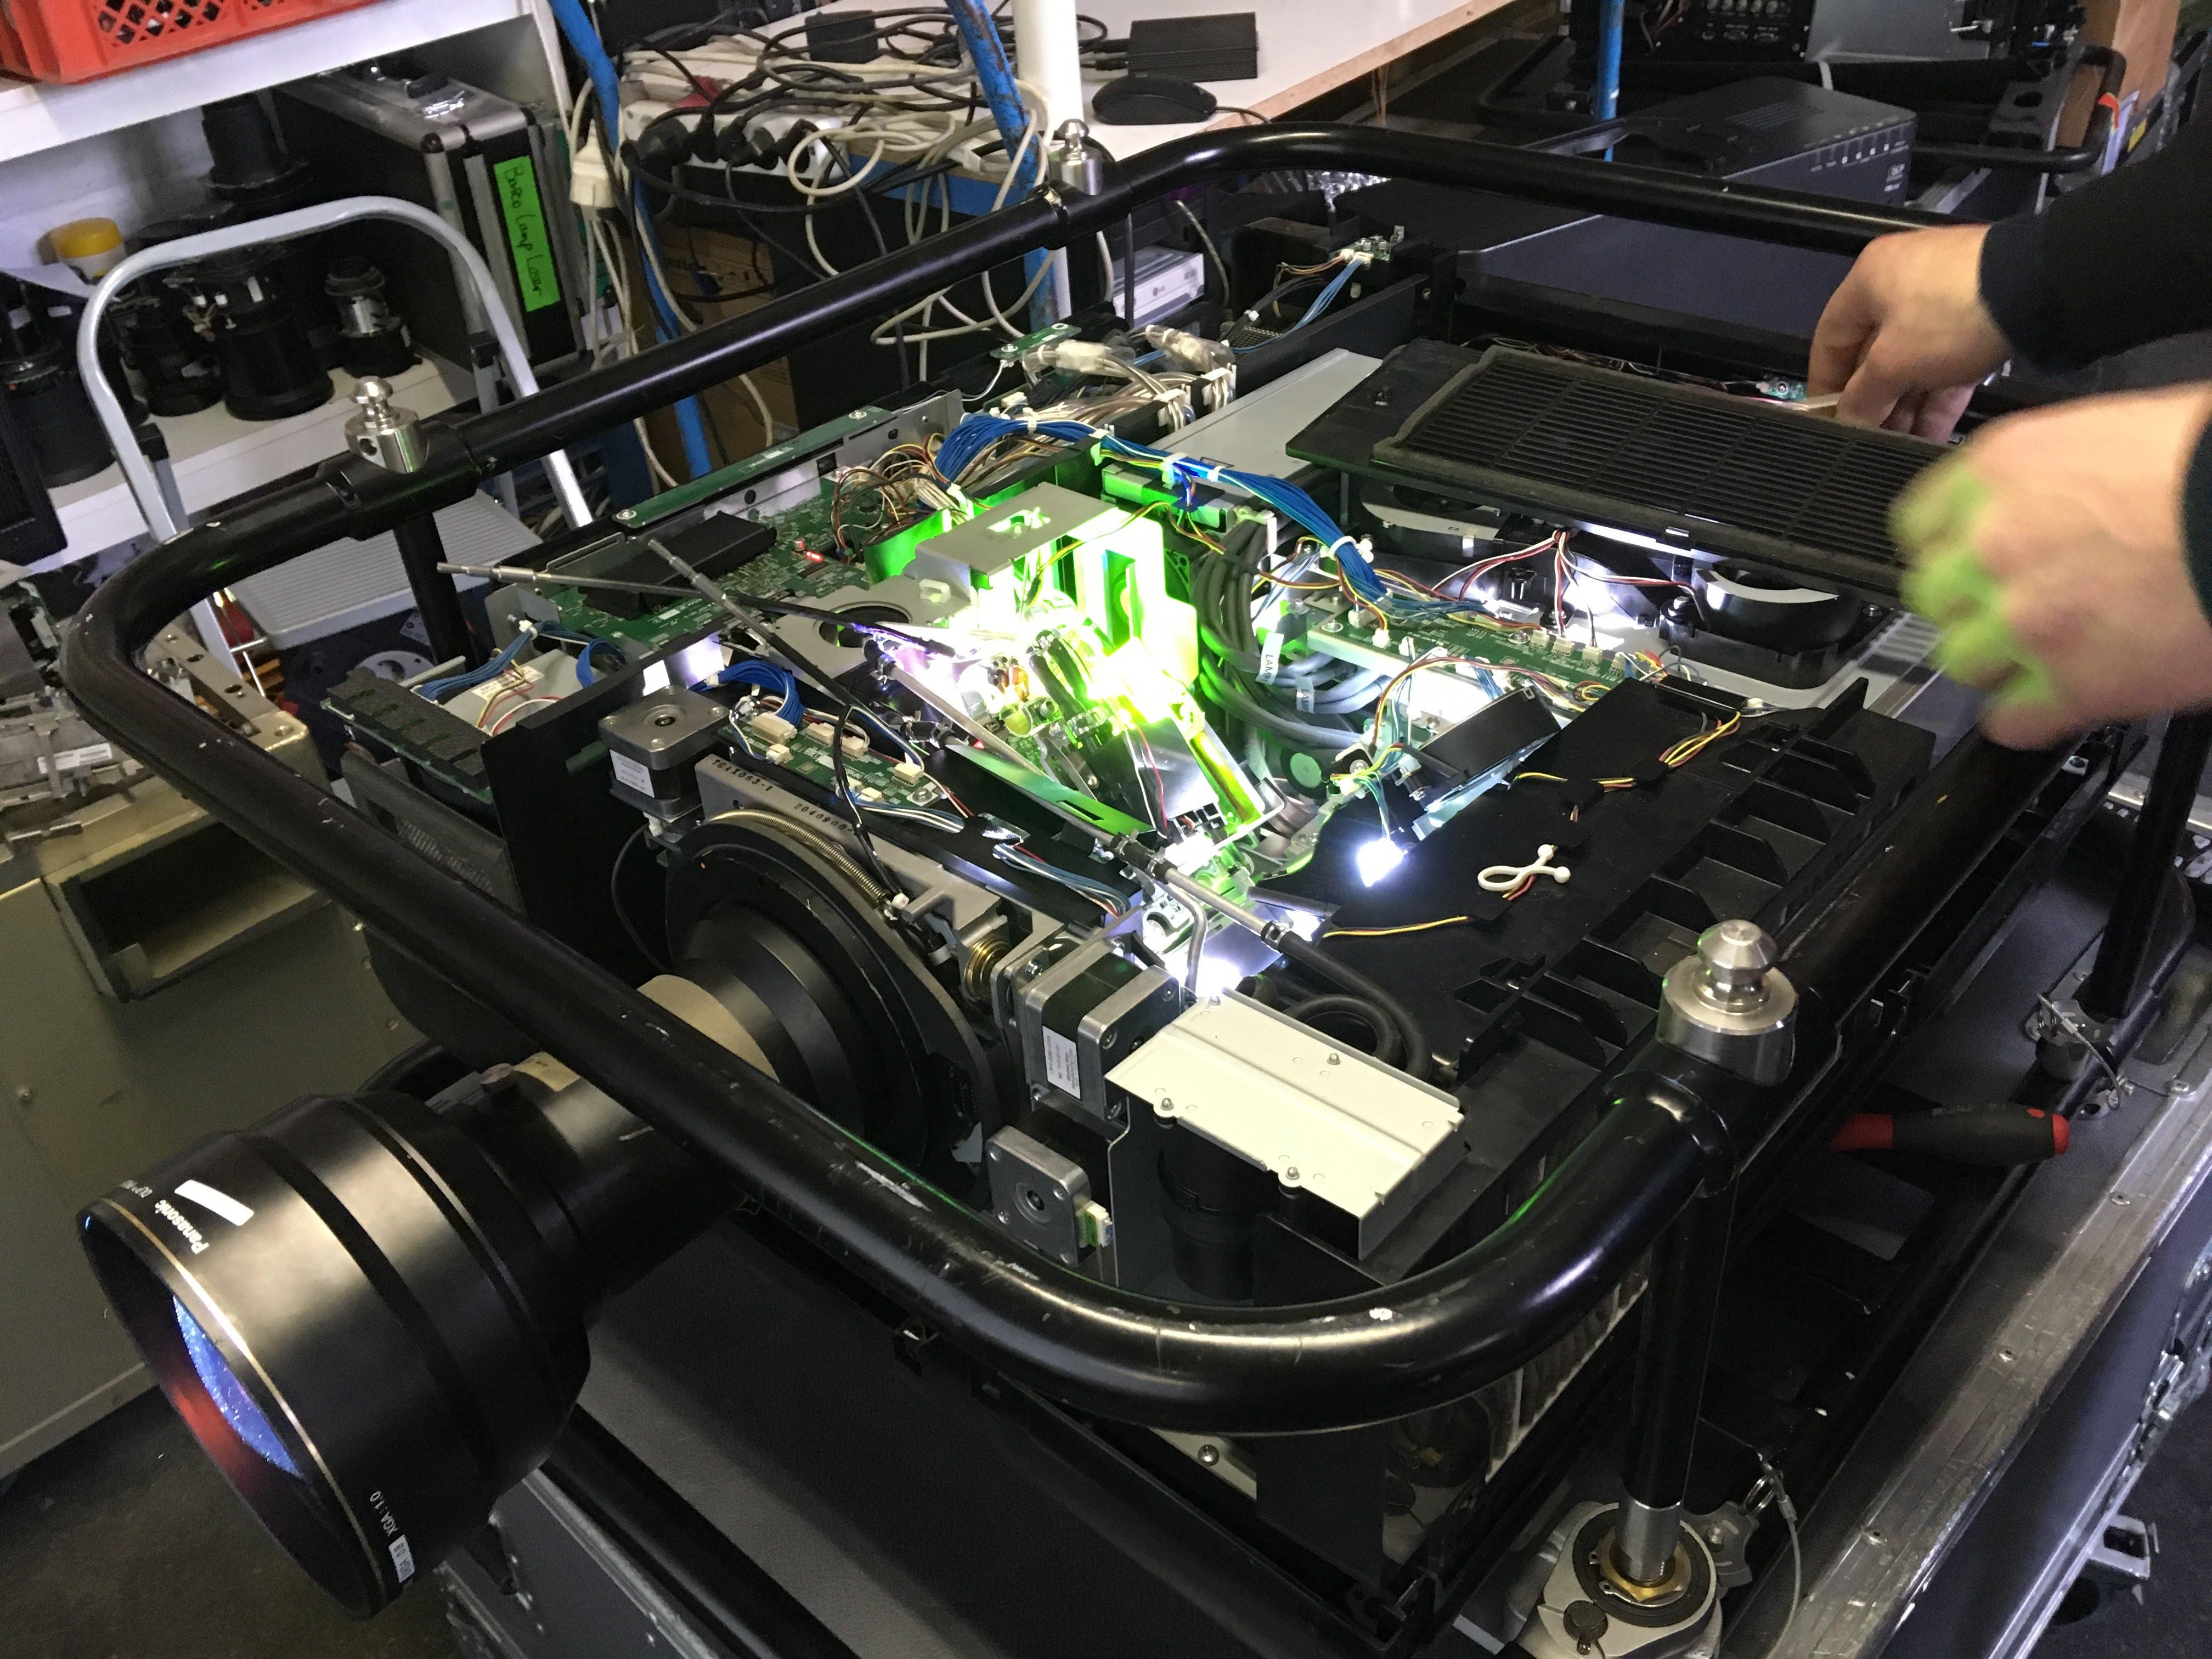 refurbishte vs. gebrauchte Projektoren. Was ist Refurbishment?